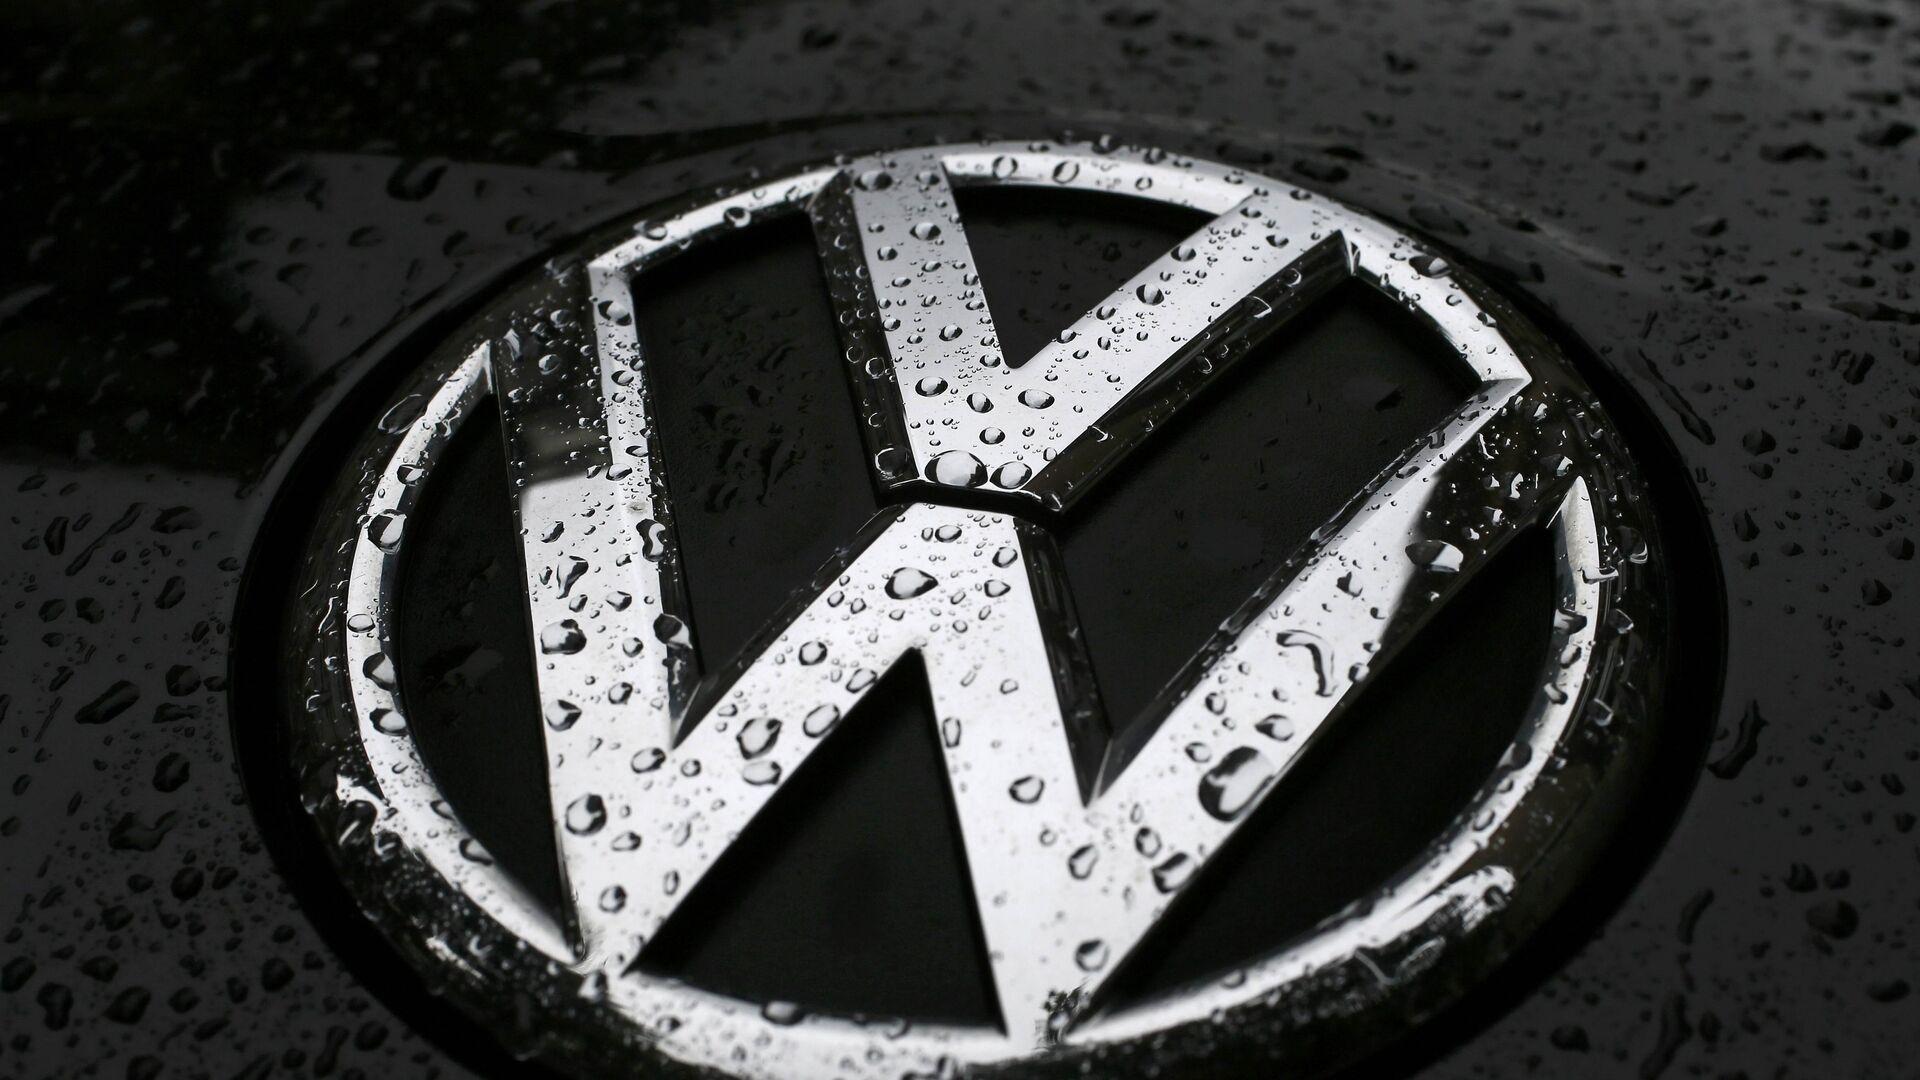 Raindrops are seen on the badge of a diesel Volkswagen Passat in central London, Britain September 22, 2015 - Sputnik Mundo, 1920, 09.06.2021